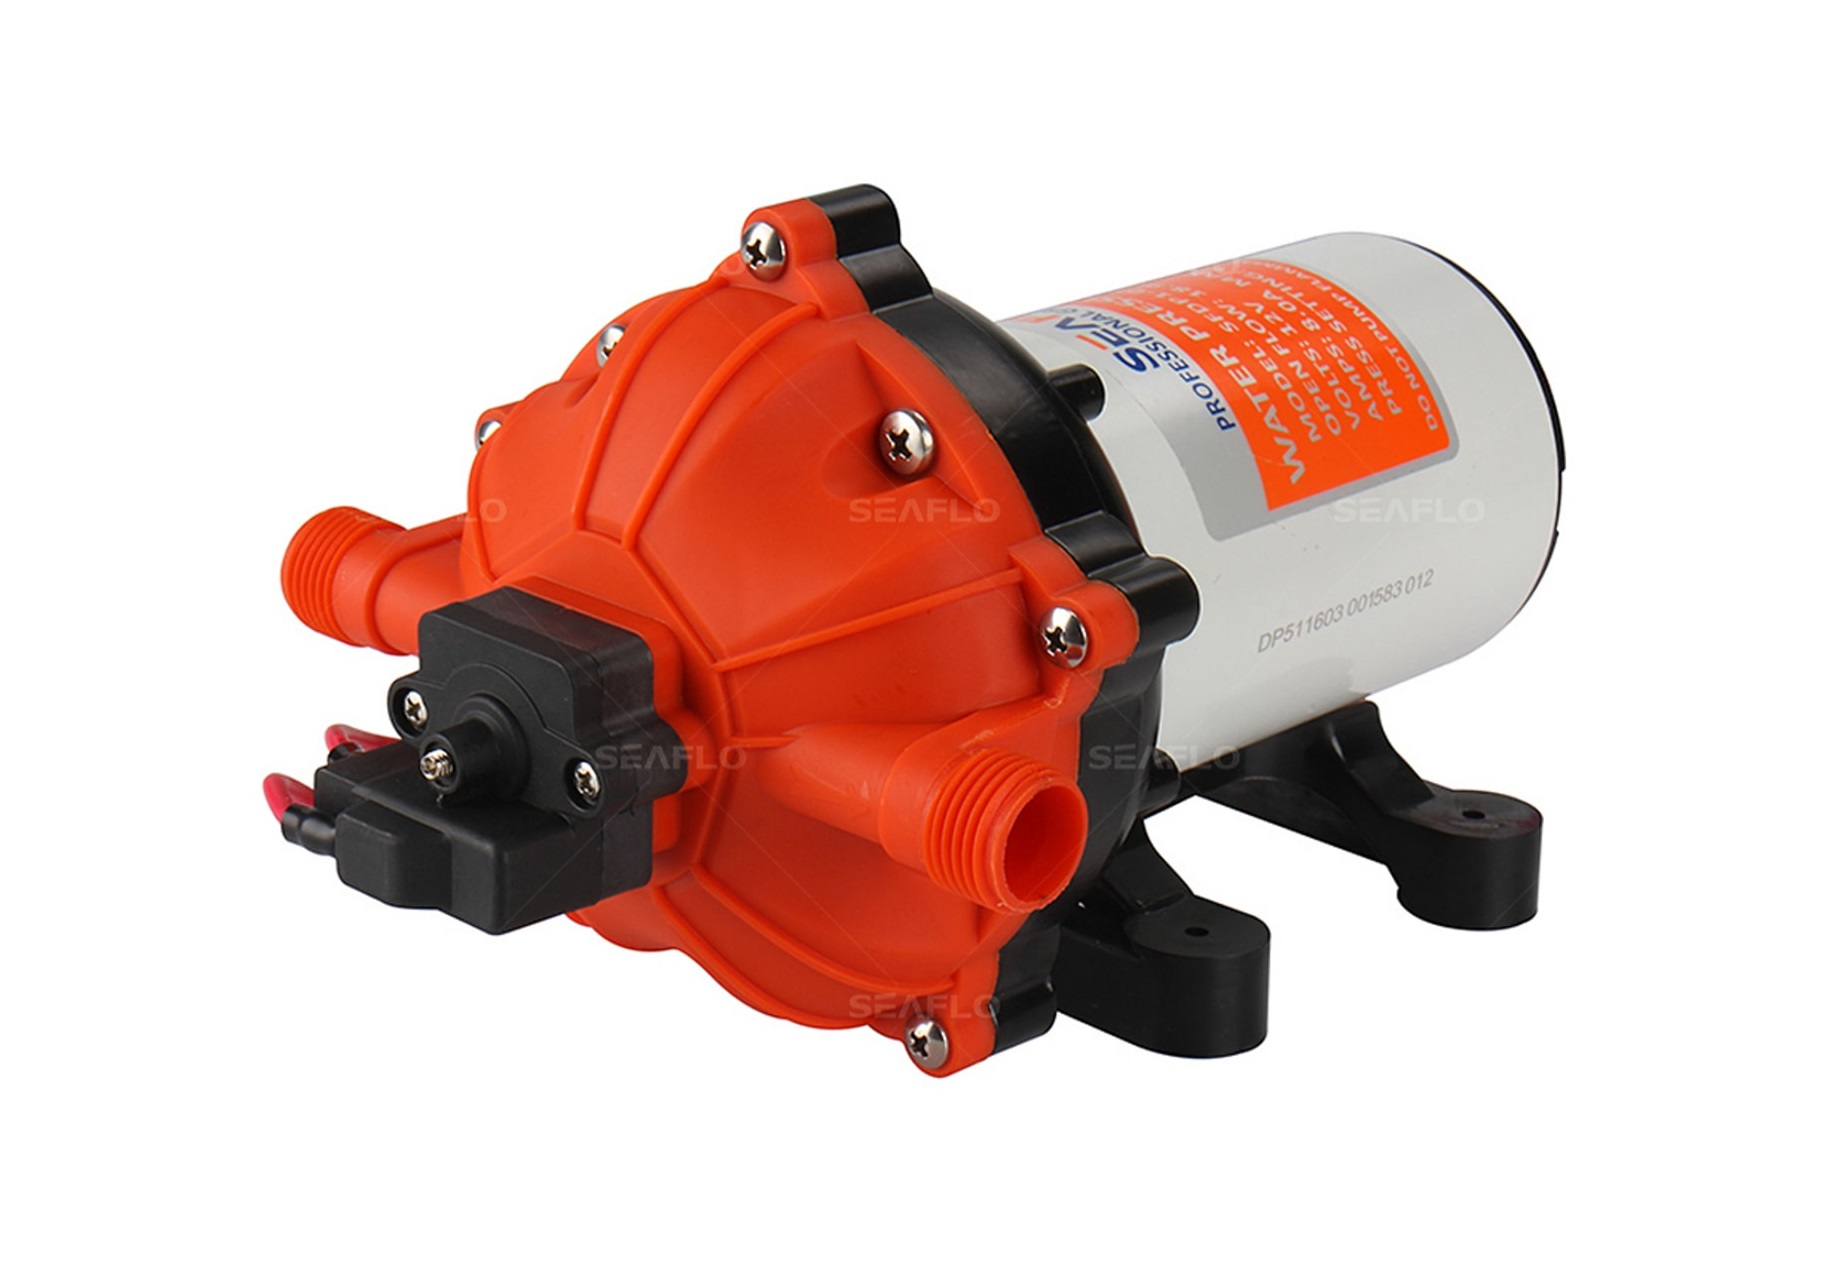 rv water pump wiring diagram vtec obd2 flotec submersible best library shur flo shurflo 12v